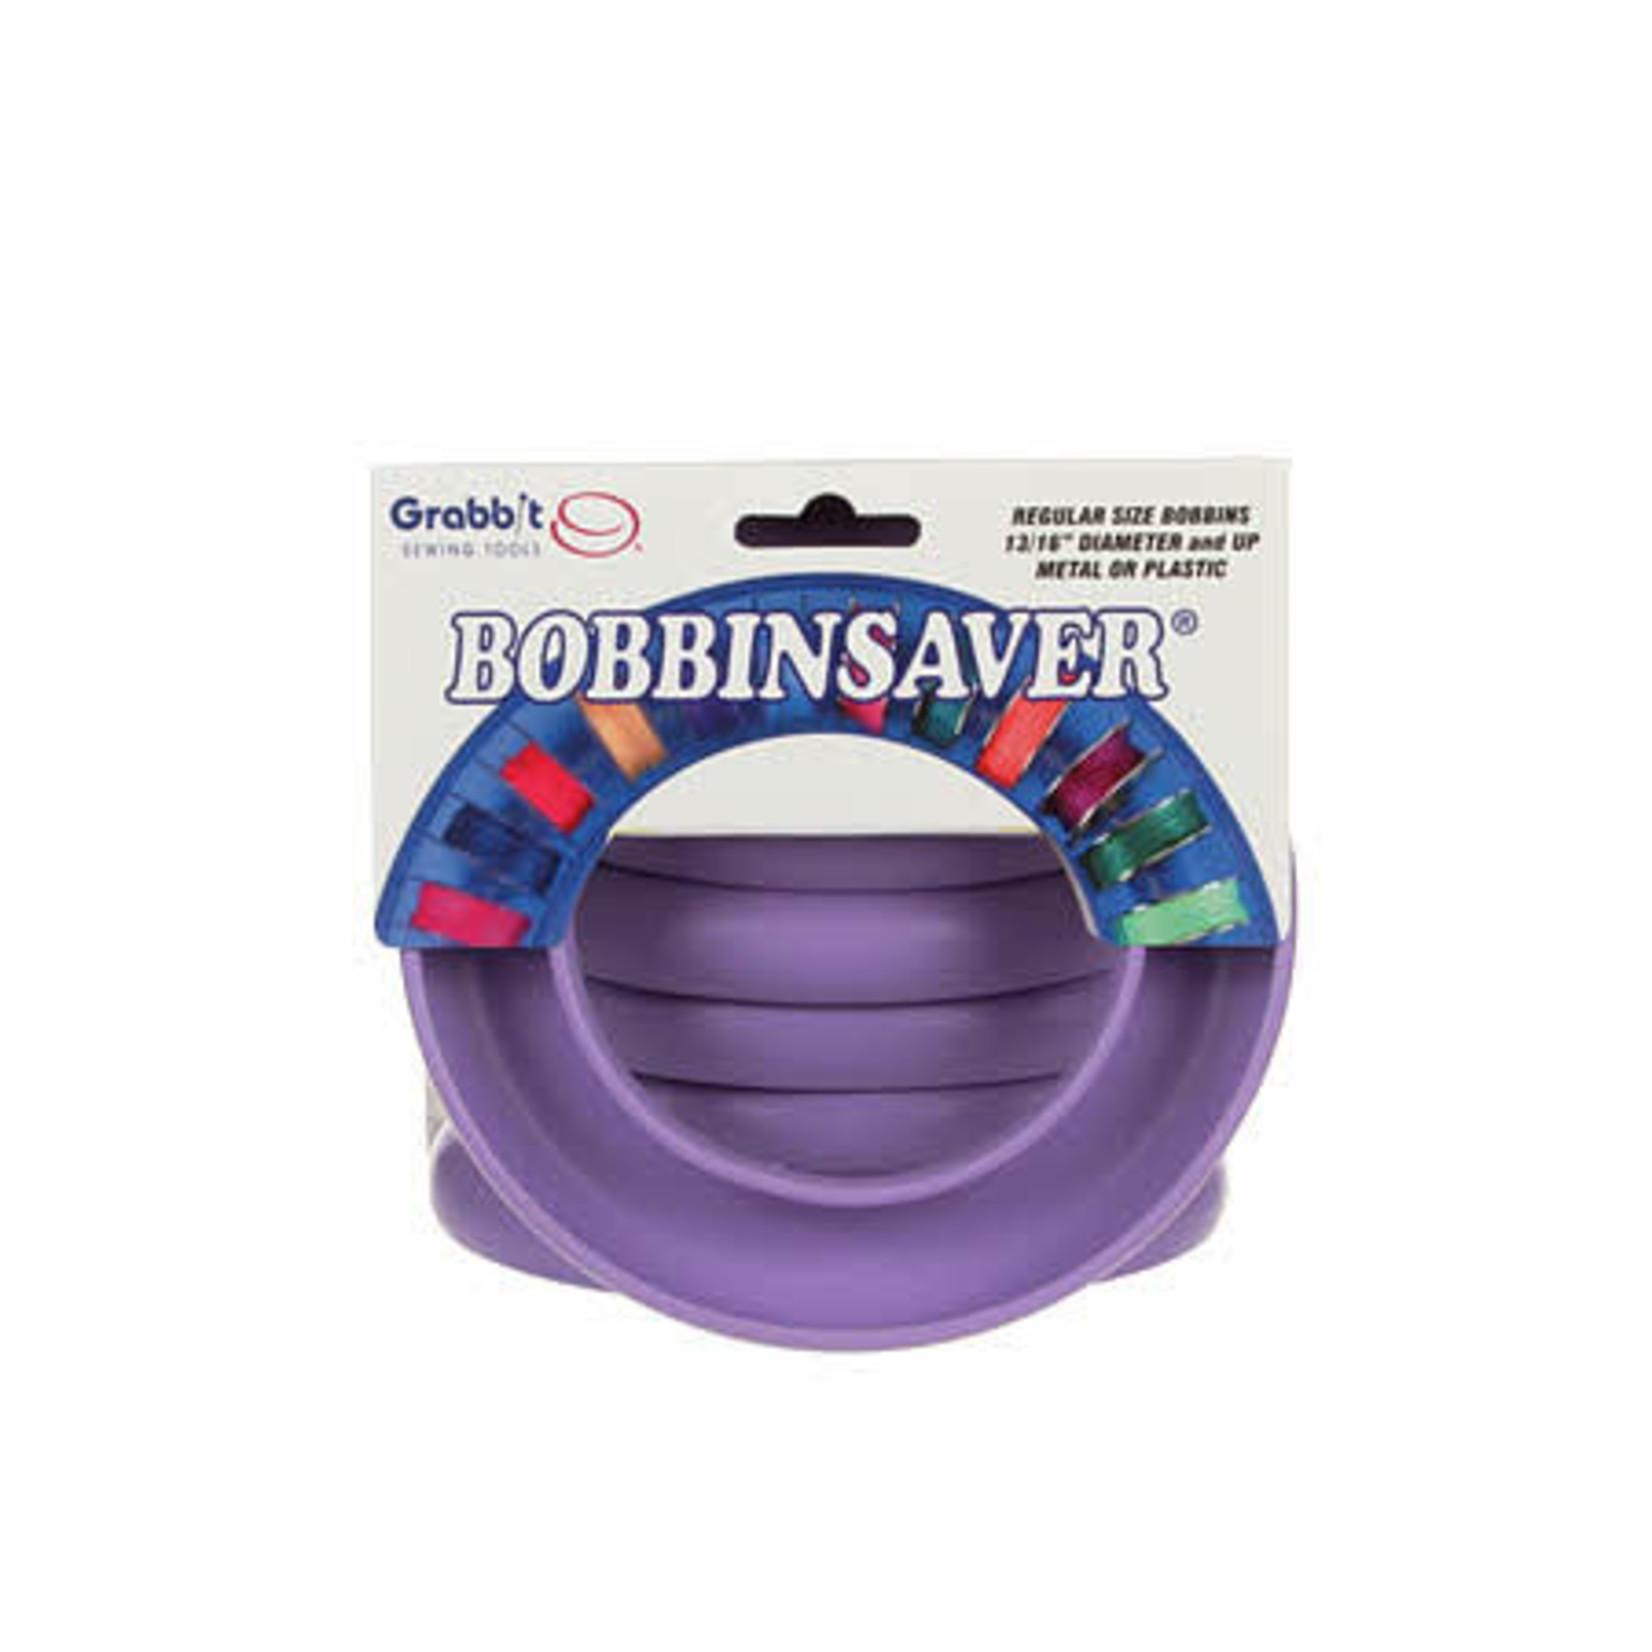 Grabbit Bobbinsaver - Spoelhouder - Lila